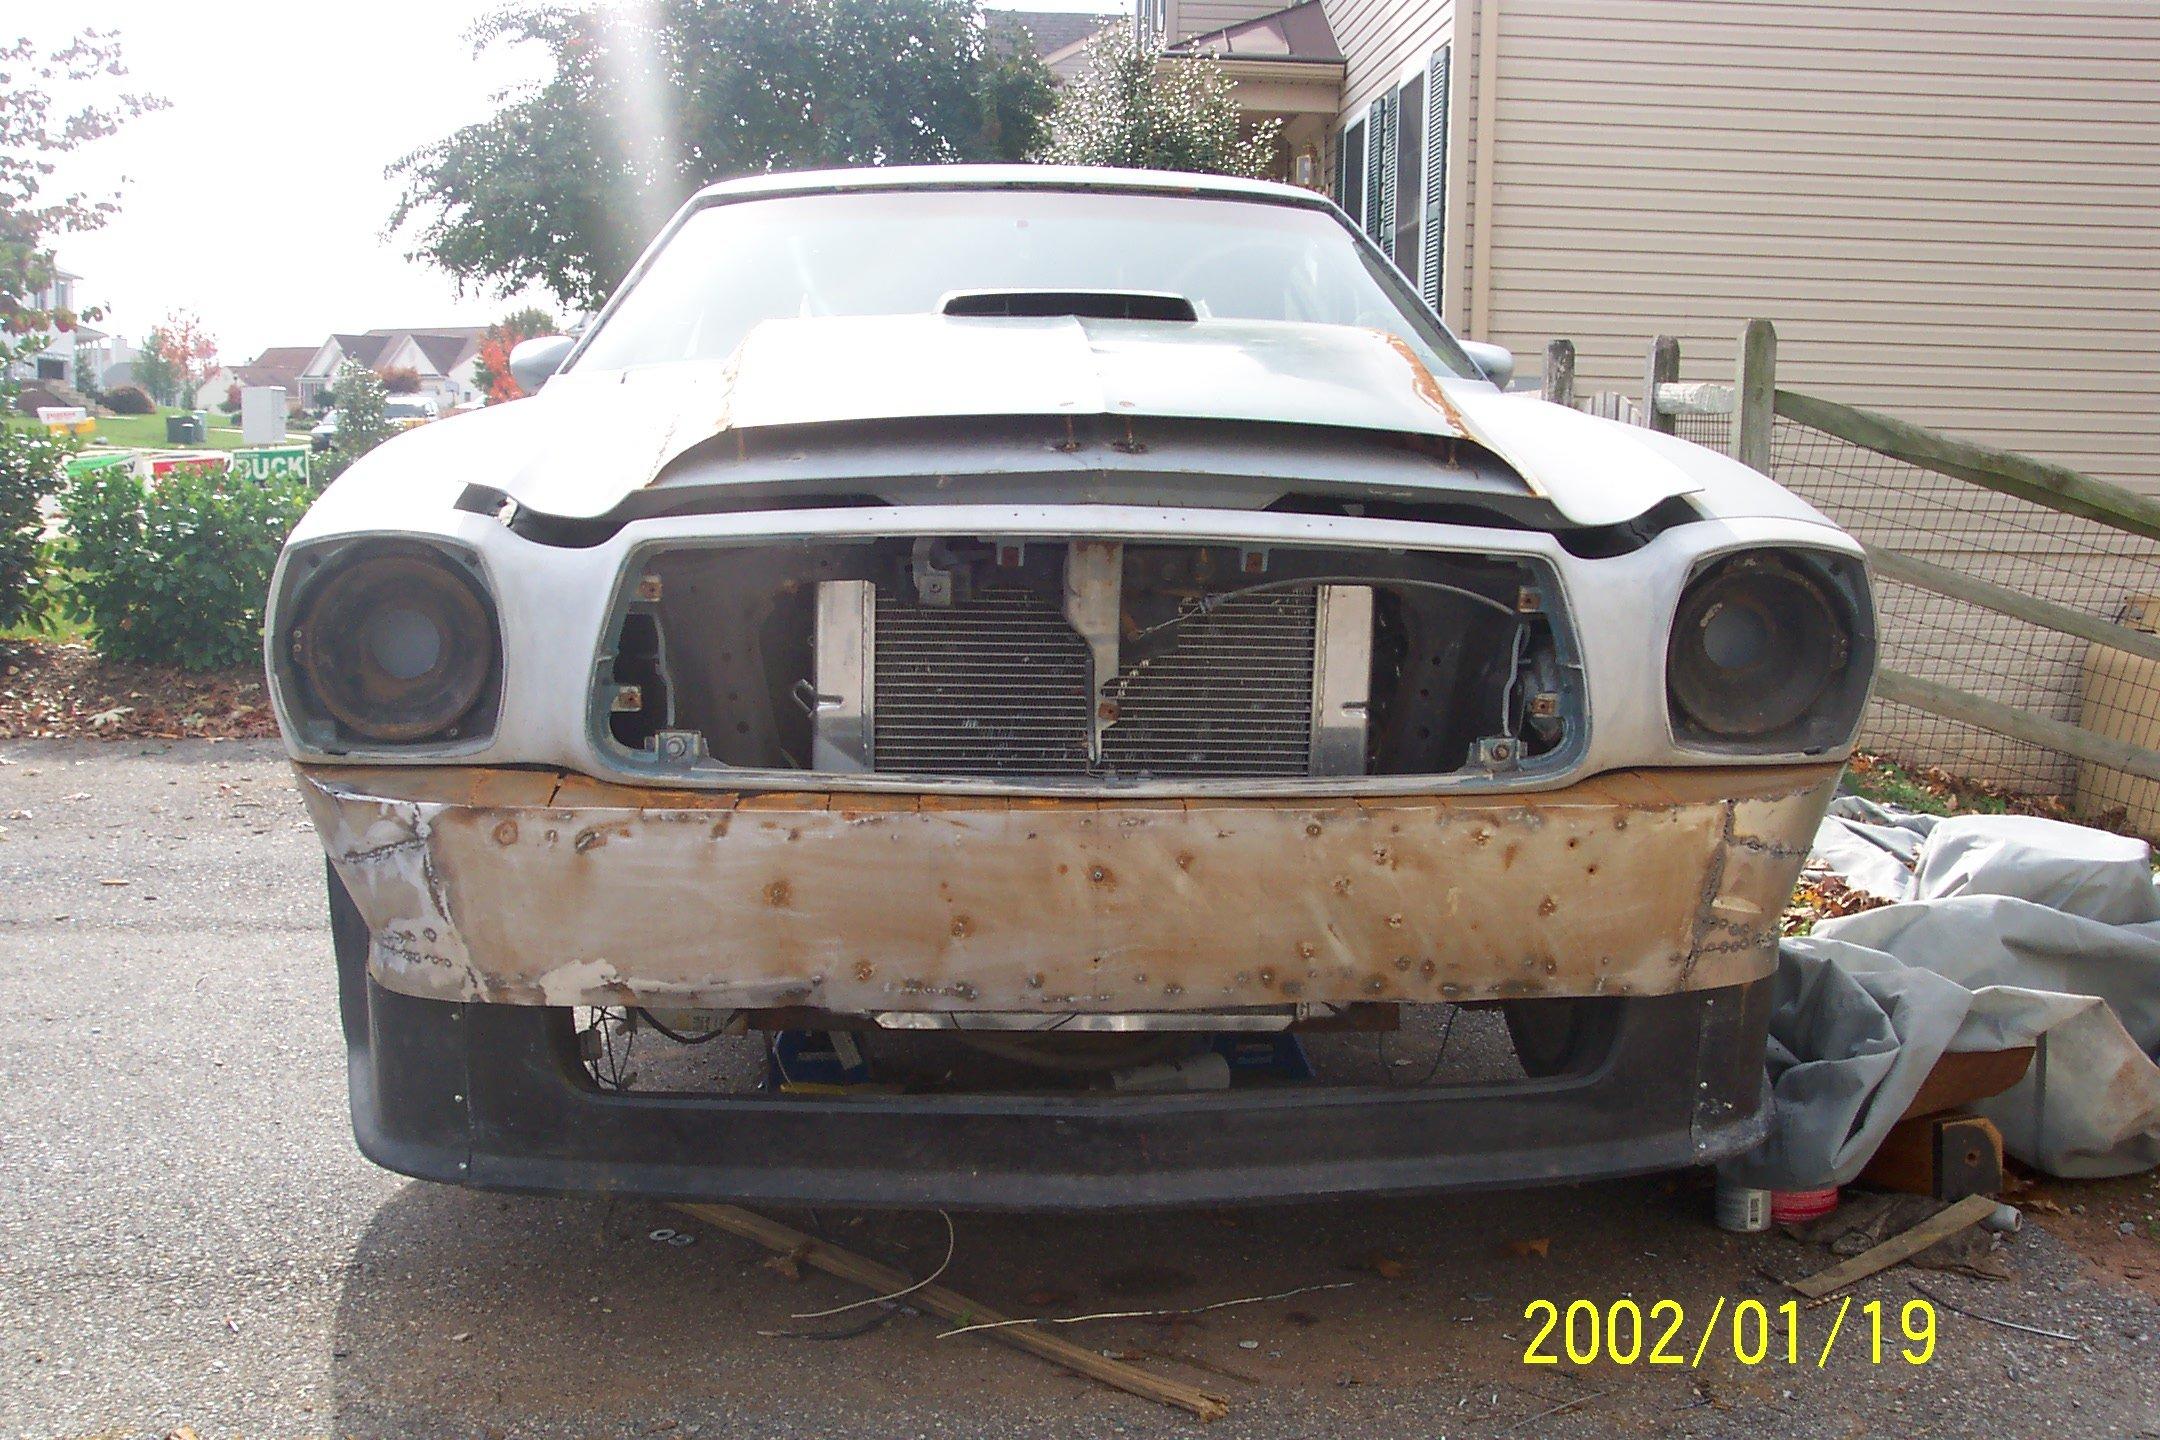 2001 Mustang Cobra Bumper >> Mustang II bumper fab complete - Ford Mustang Forum